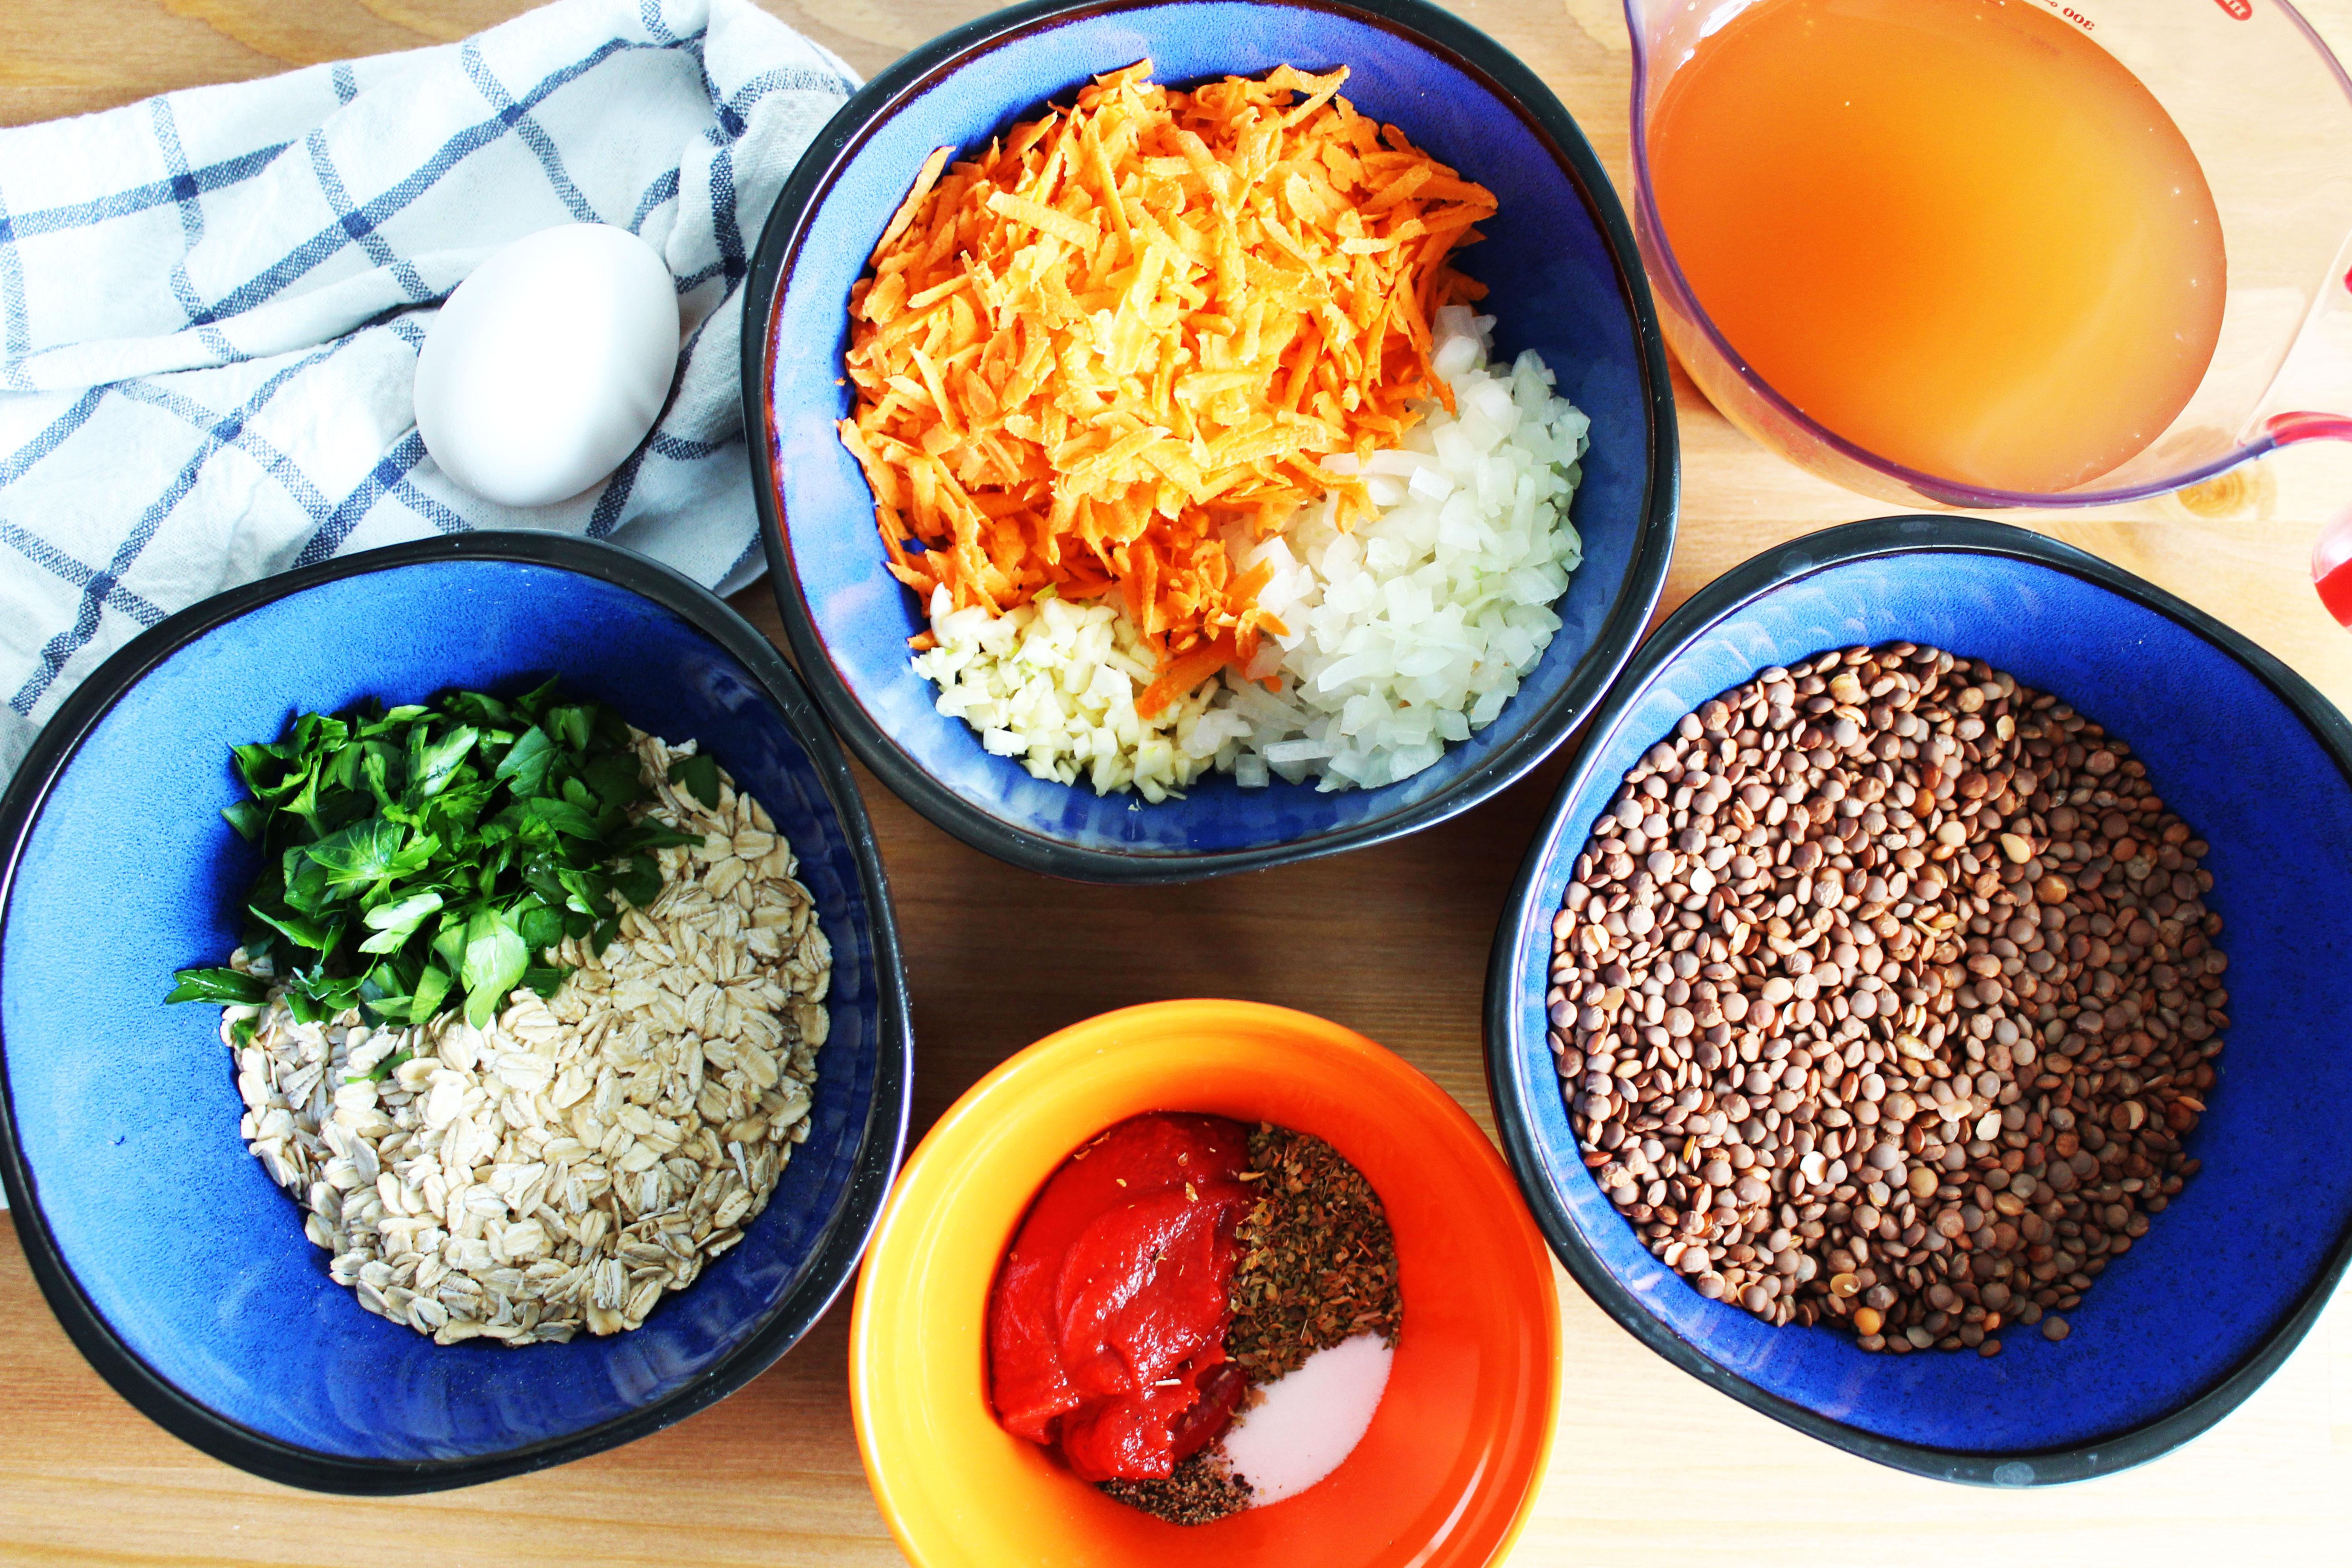 Lentil-Meatballs-Ingredients